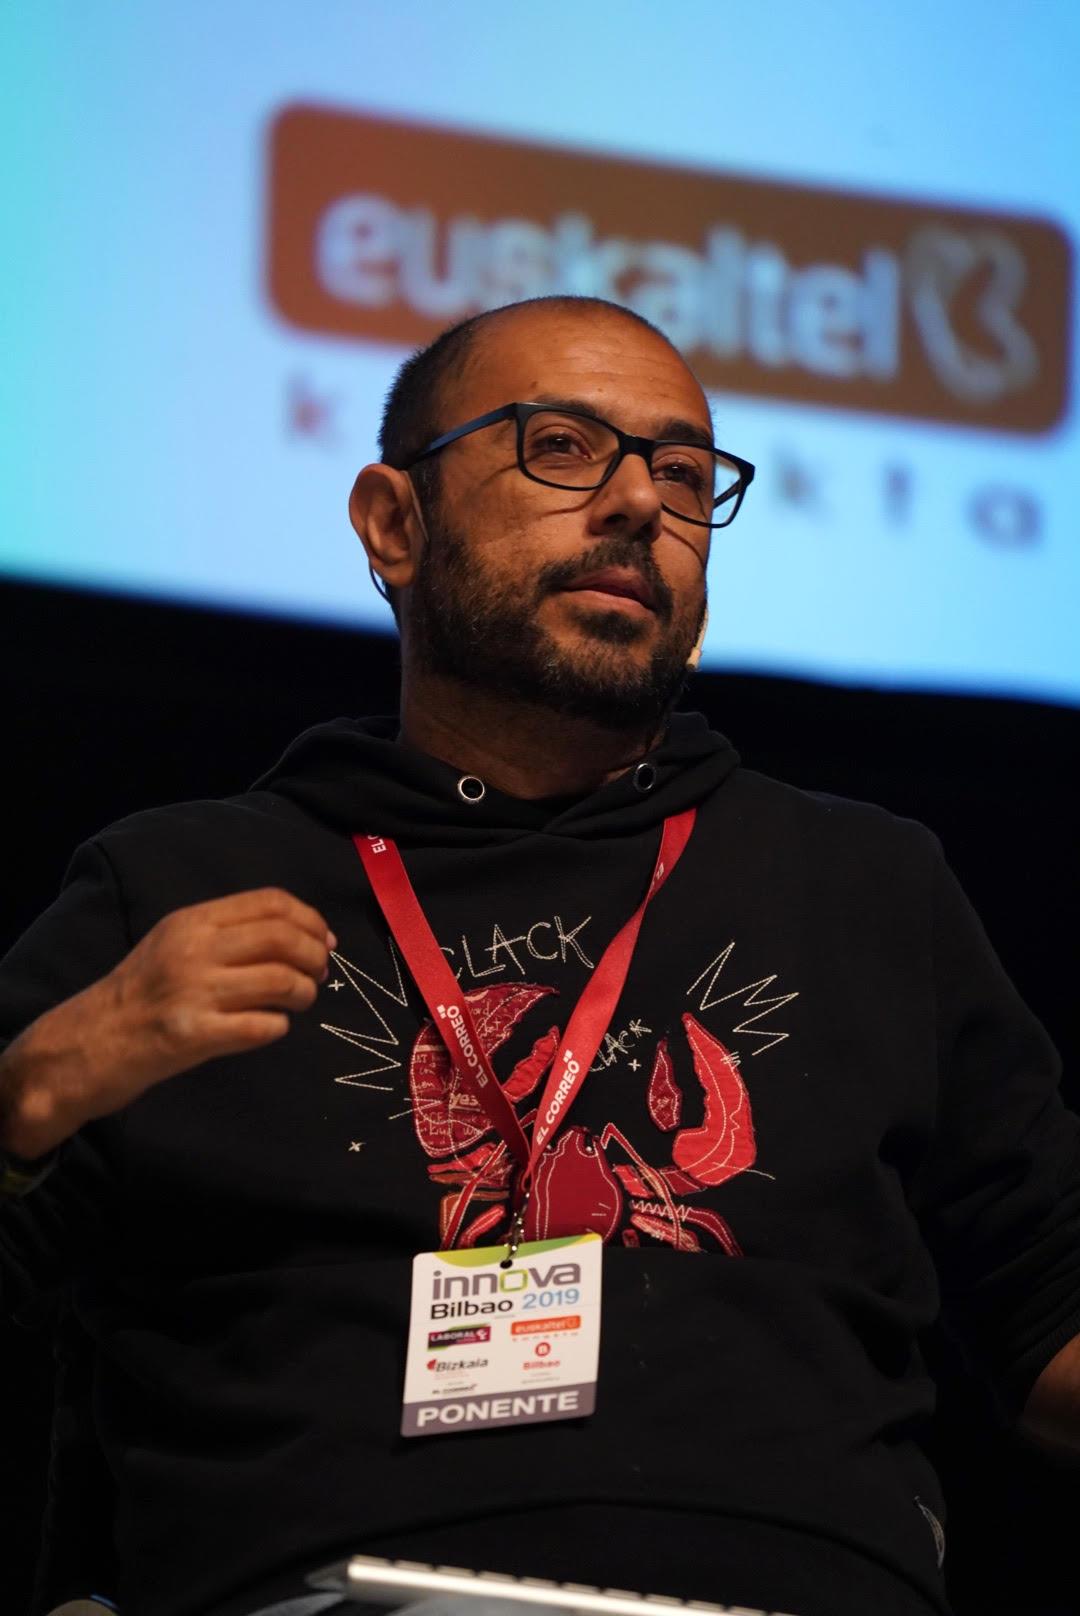 Marc Torrano